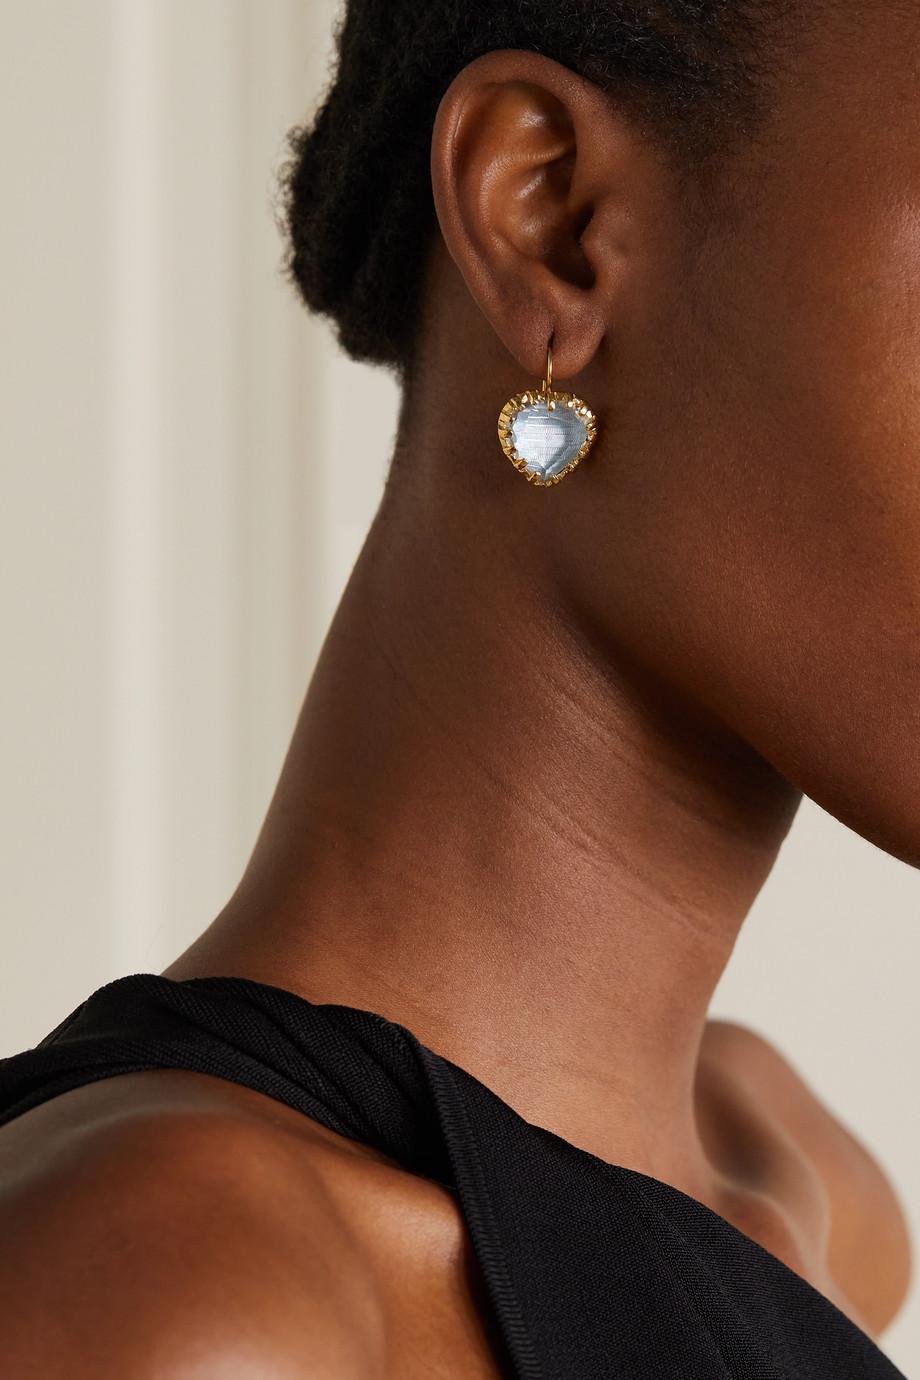 Larkspur & Hawk Valentina 18-karat gold-dipped quartz earrings